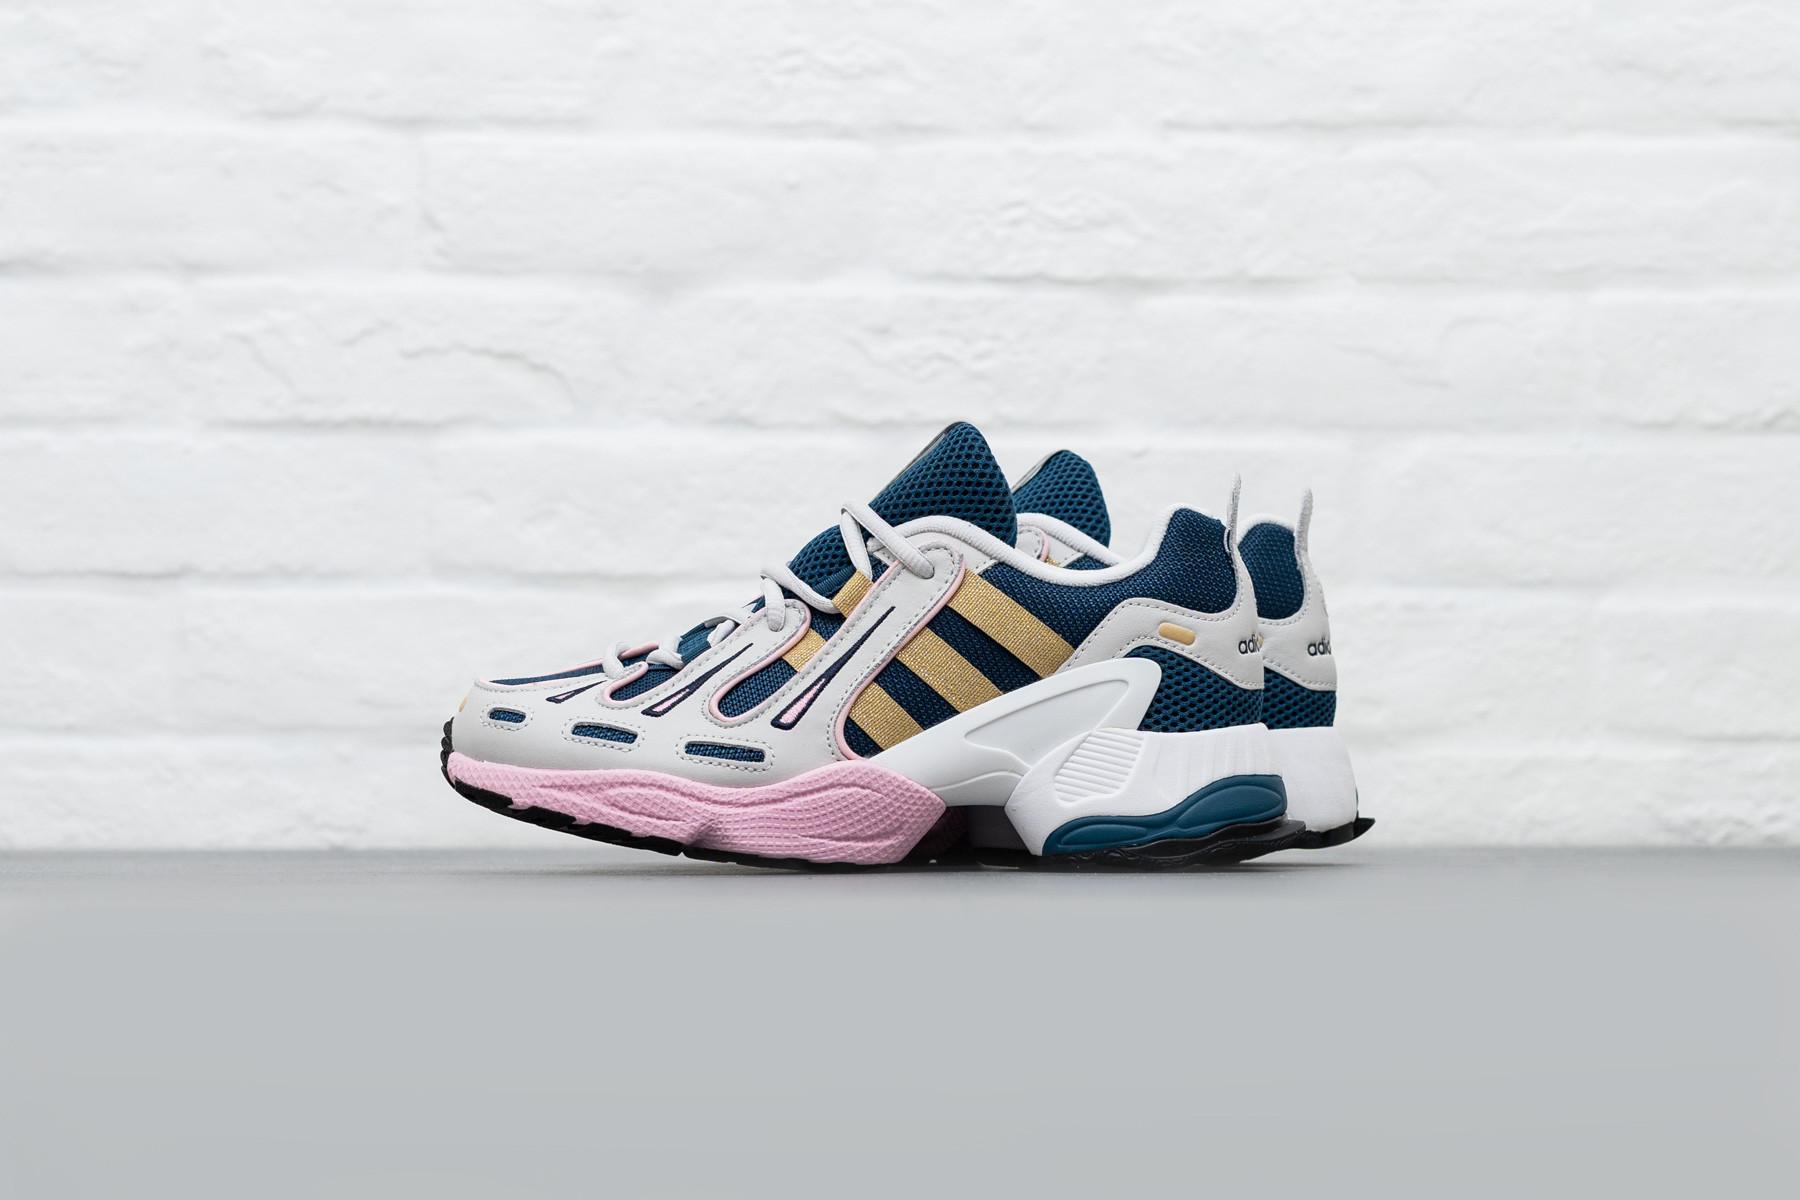 on sale 2d795 f83a6 W Adidas EQT Gazelle | Favoritter fra Adidas finner du hos ...